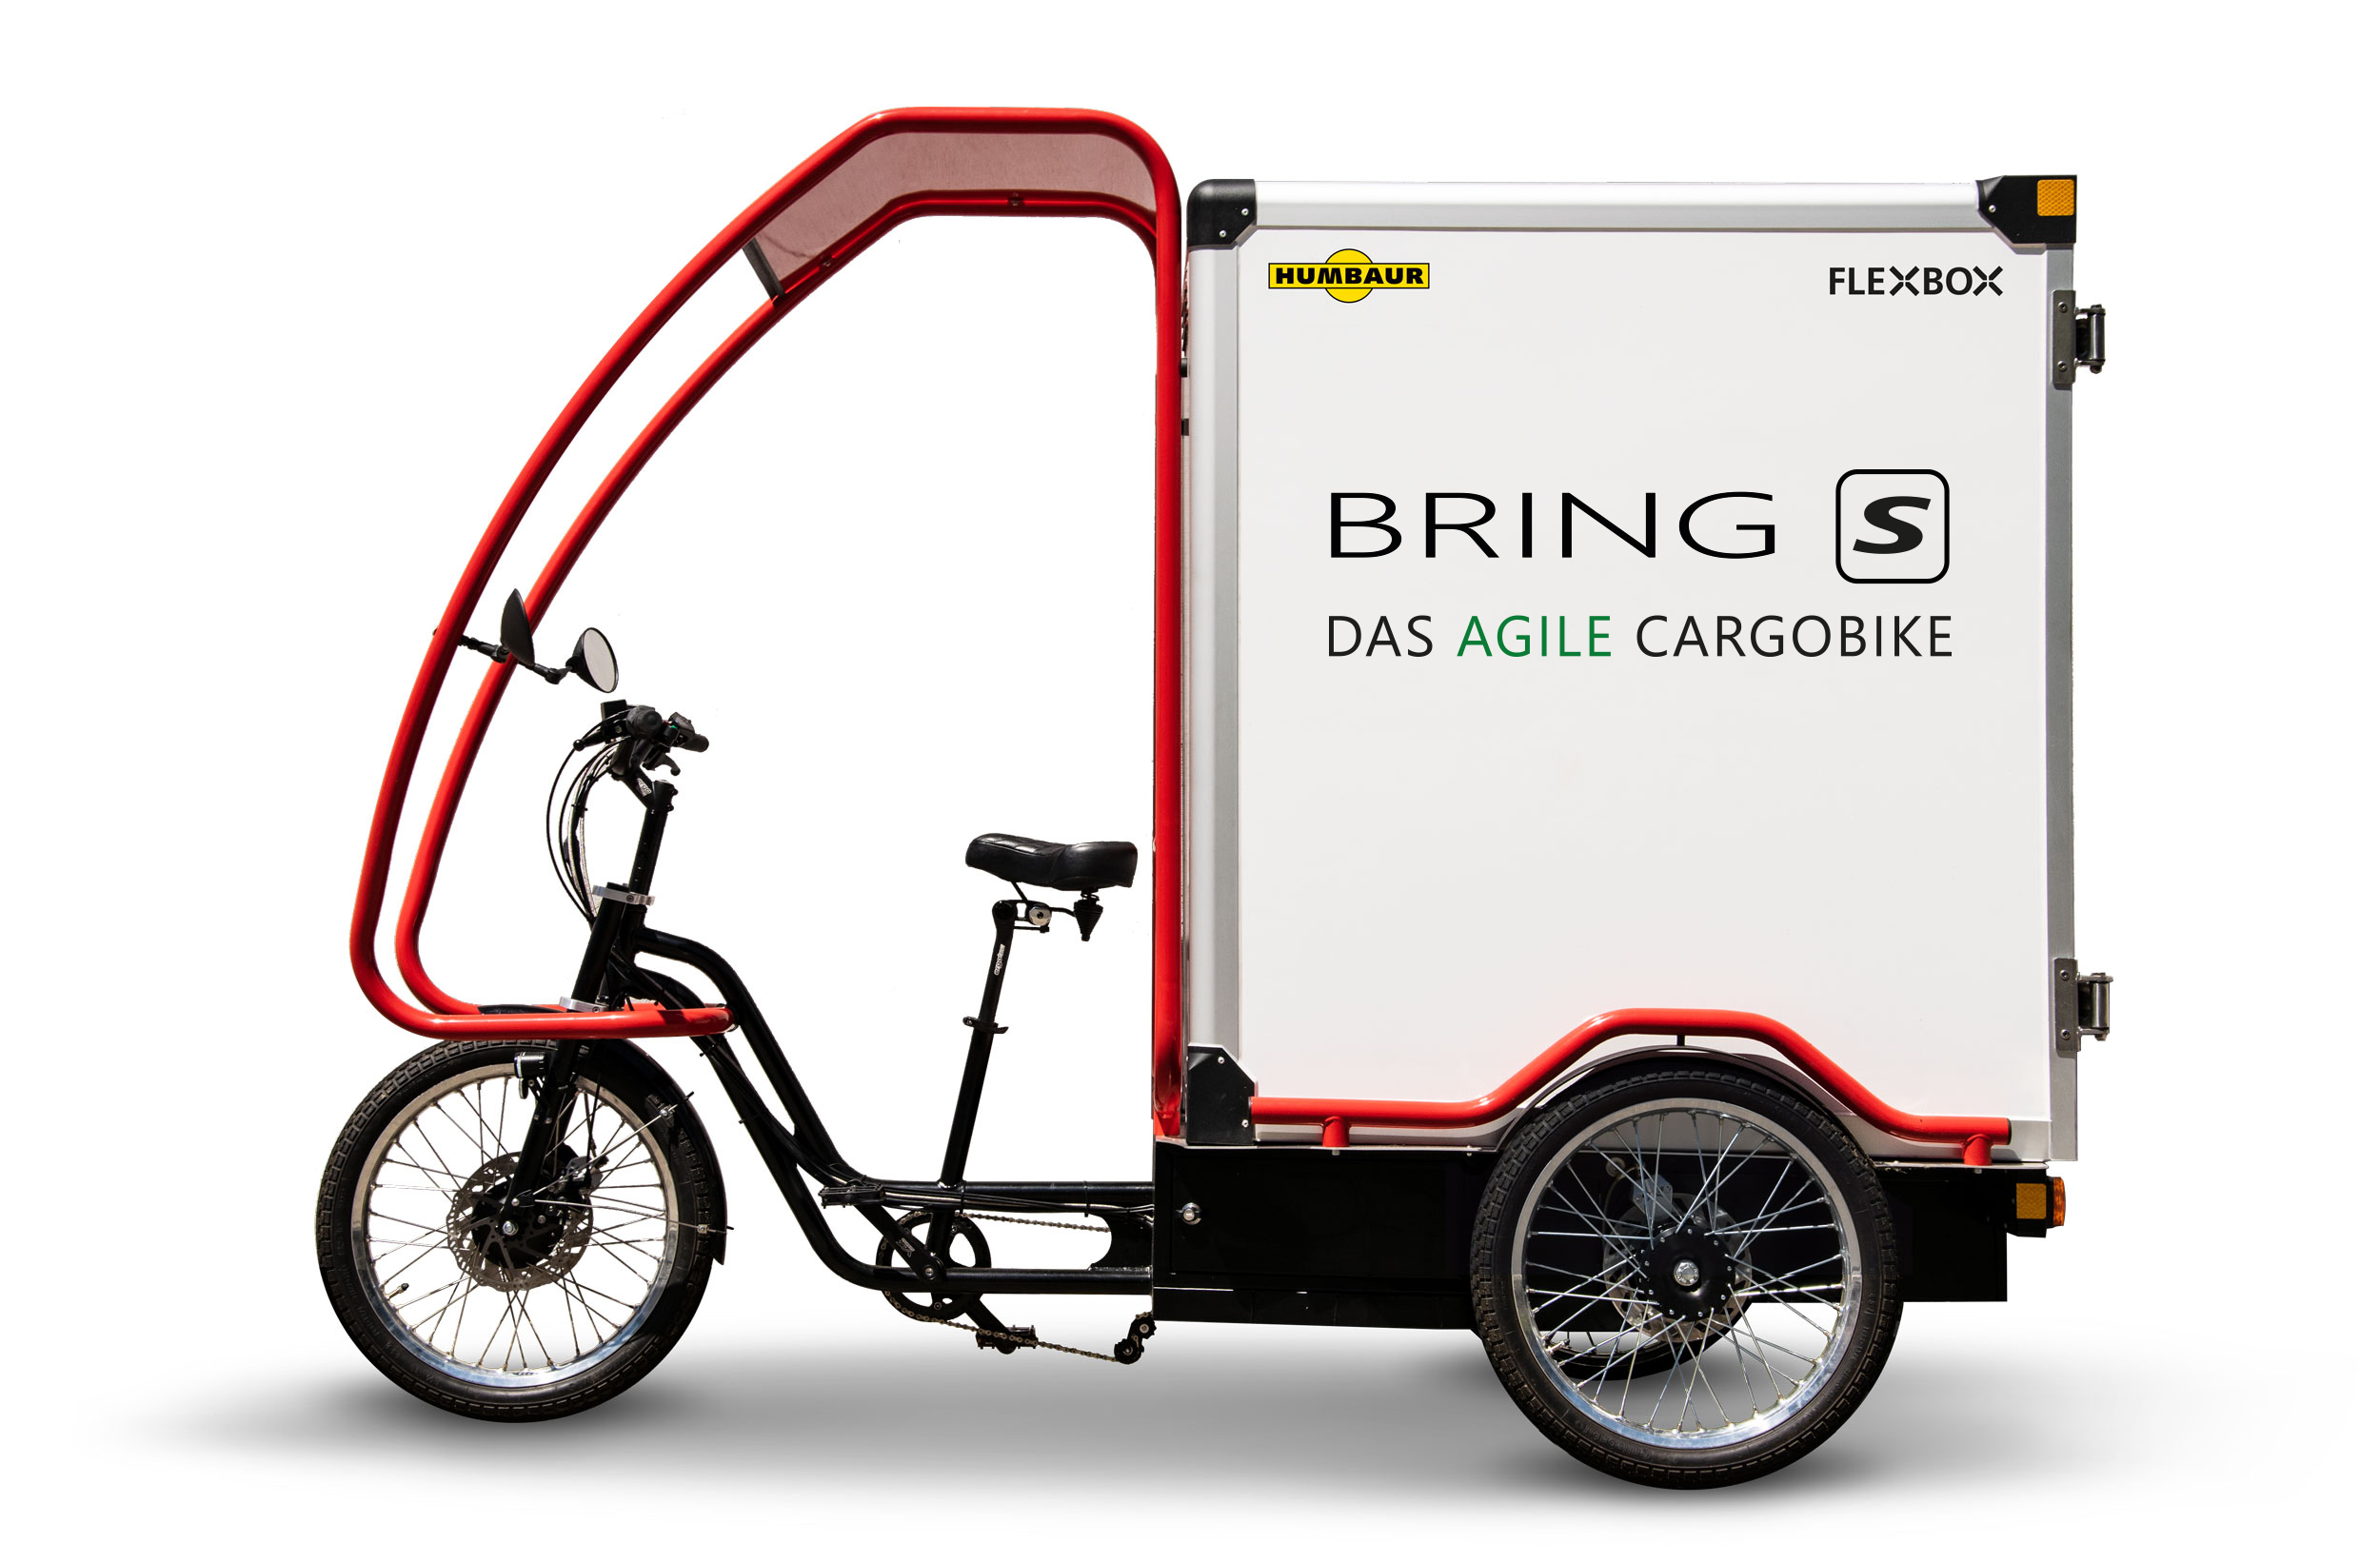 BRING DUAL MOTOR DRIVE 48 V, 250 W, 200 Nm, Nabenschaltung Nexus